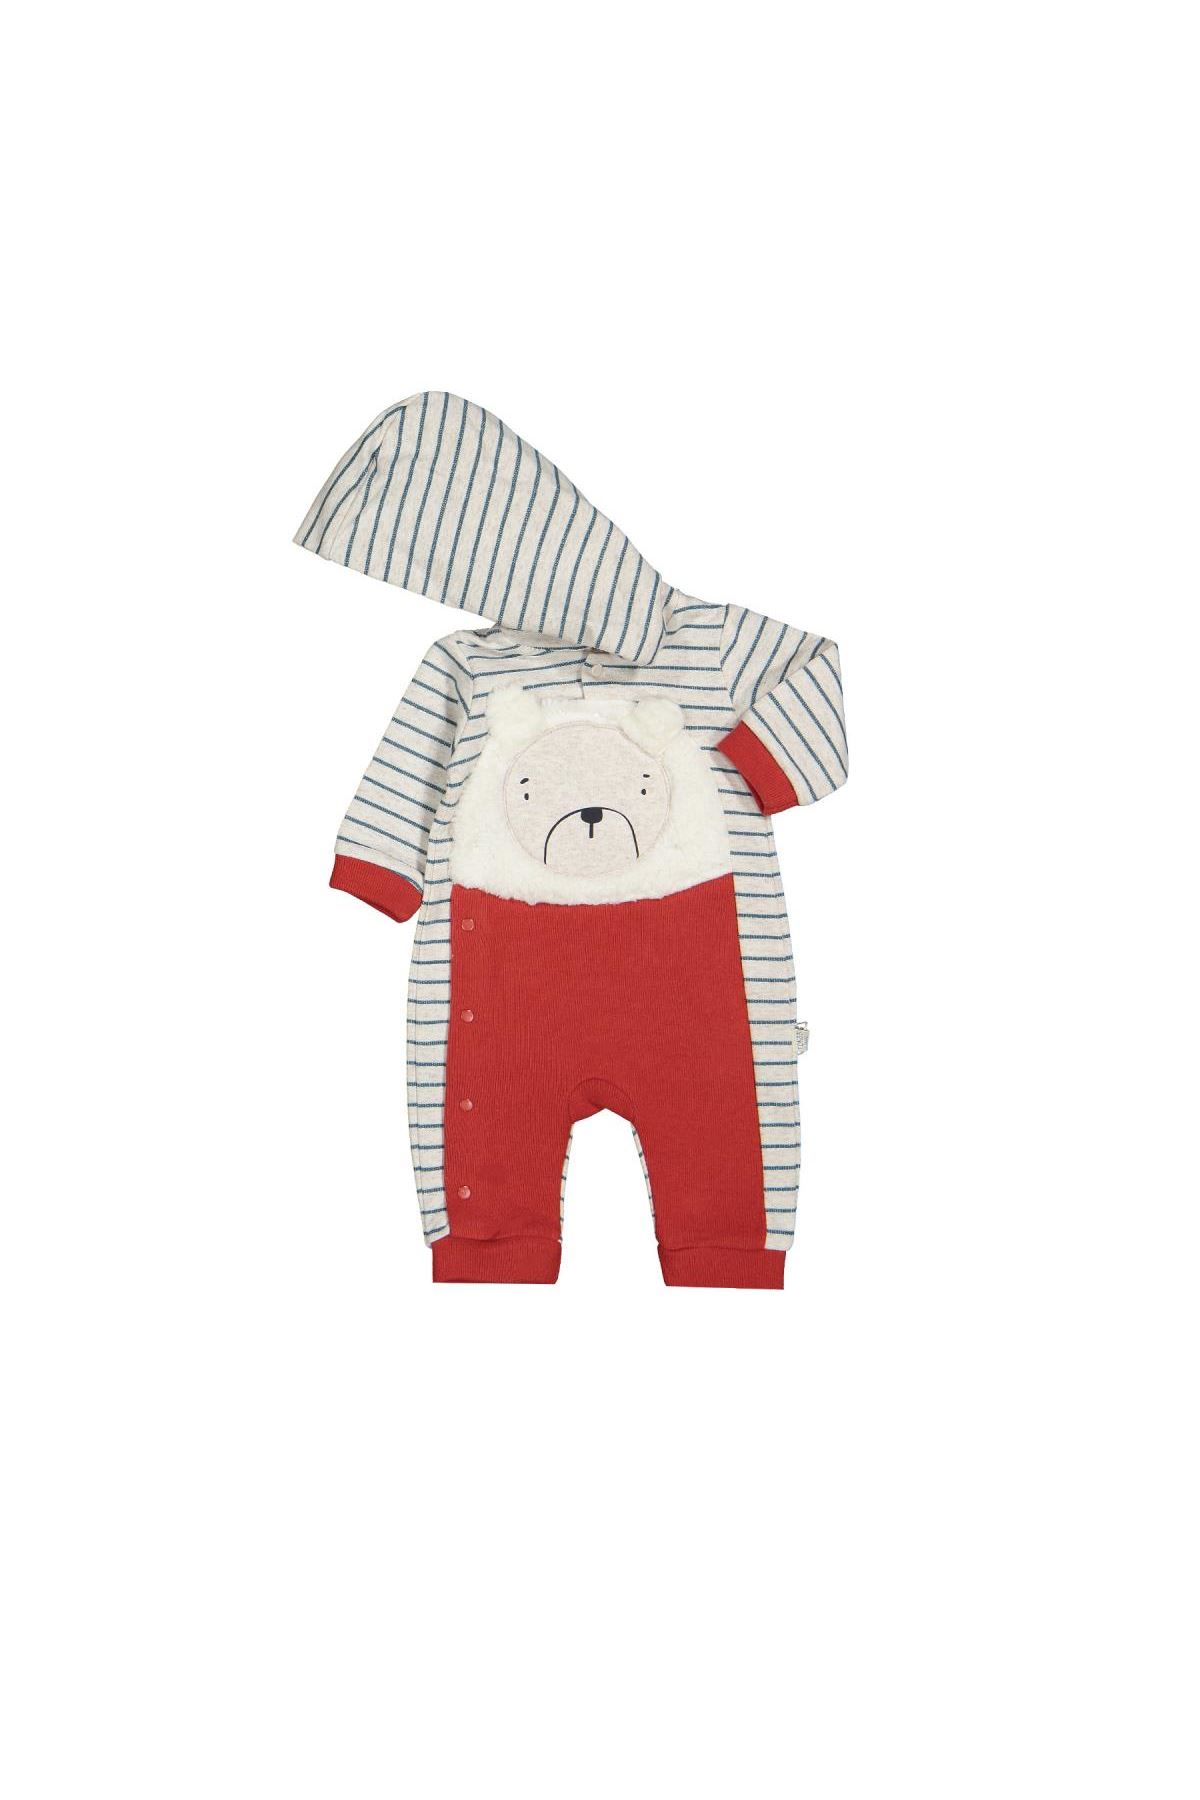 Tongs Baby North Pole Bebek Tulum 2751 Kızıl